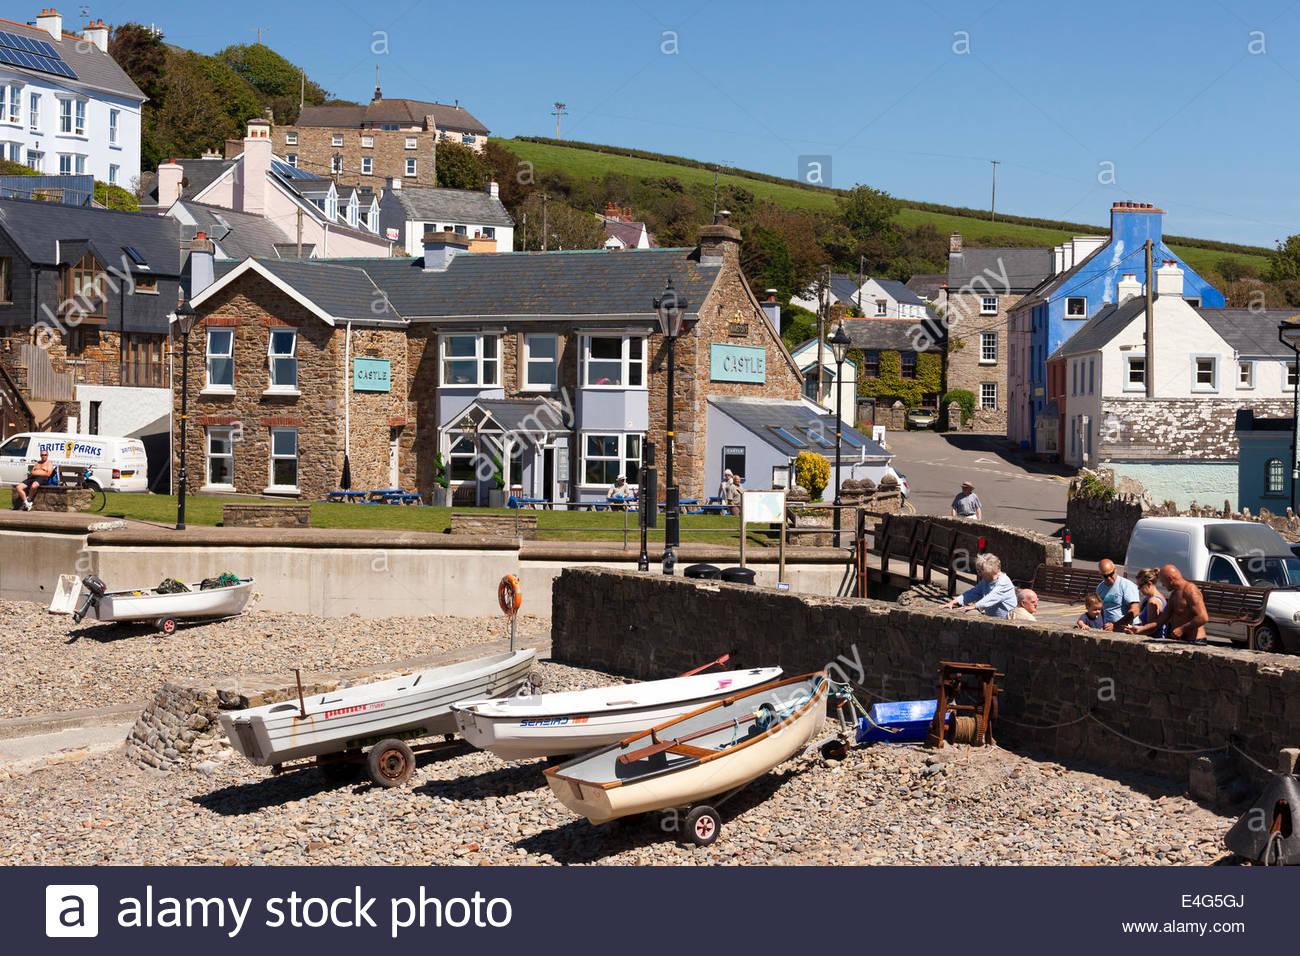 Little Haven Pembrokeshire Wales Britain UK - Stock Image